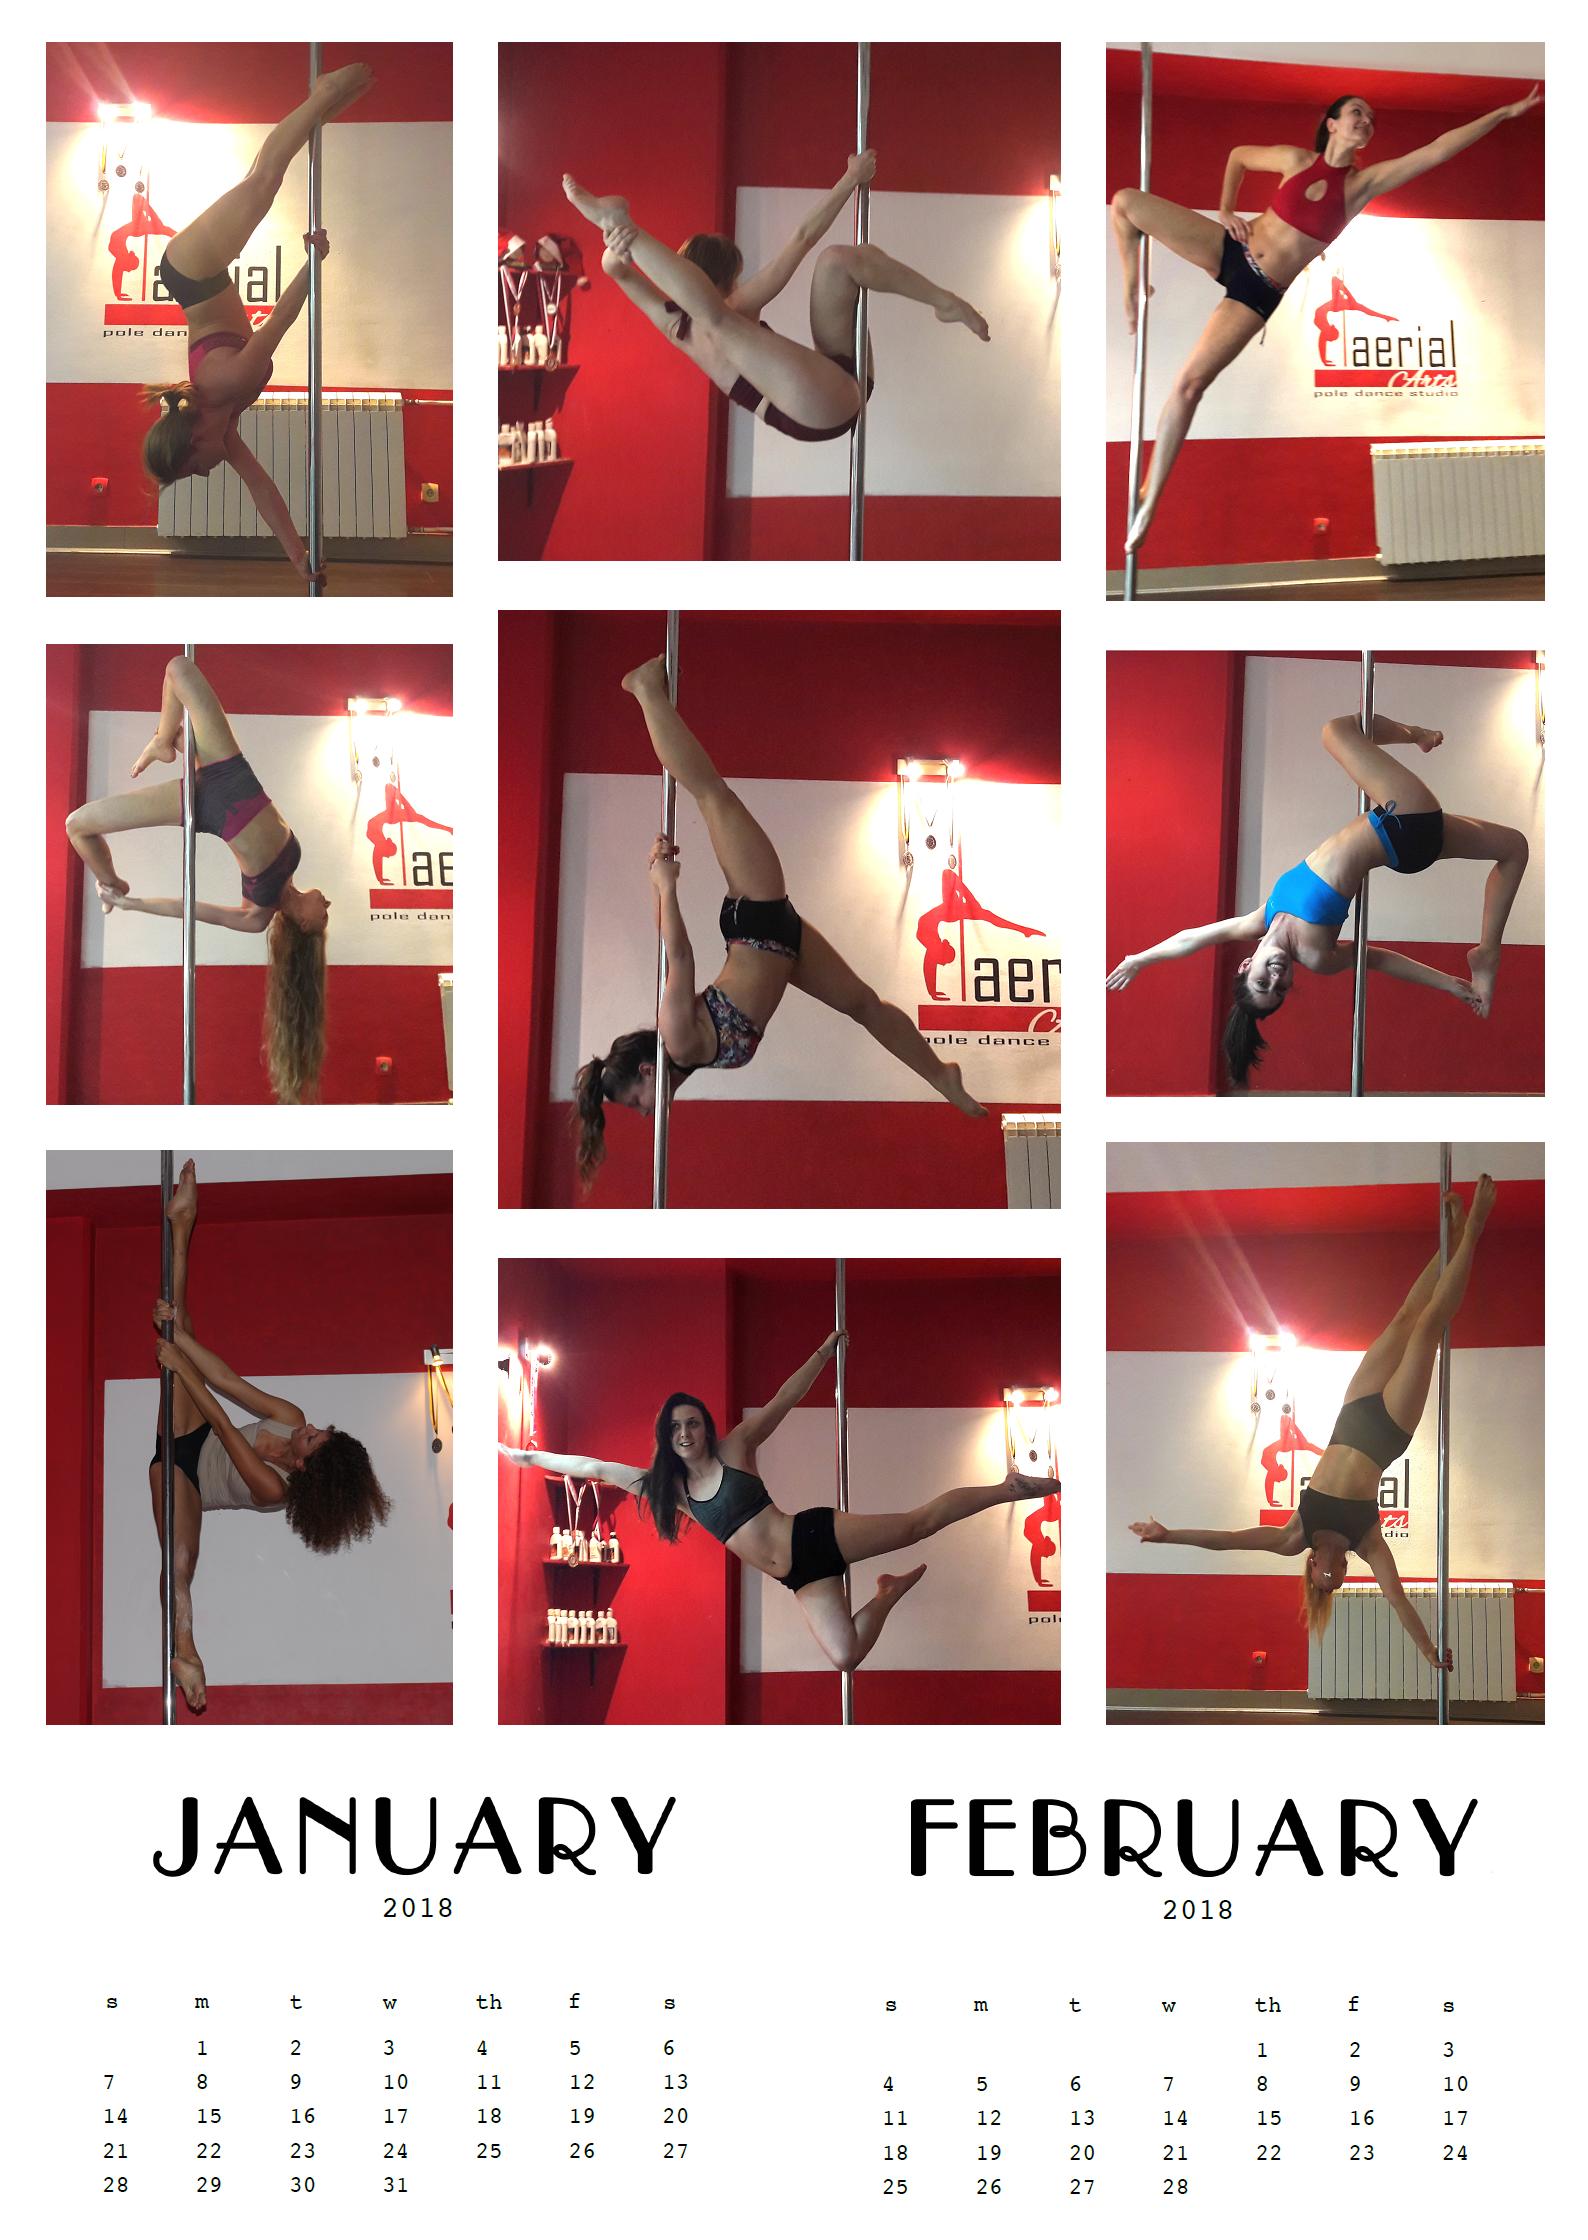 Prvi kalendar iz 2018, januar/februar :)